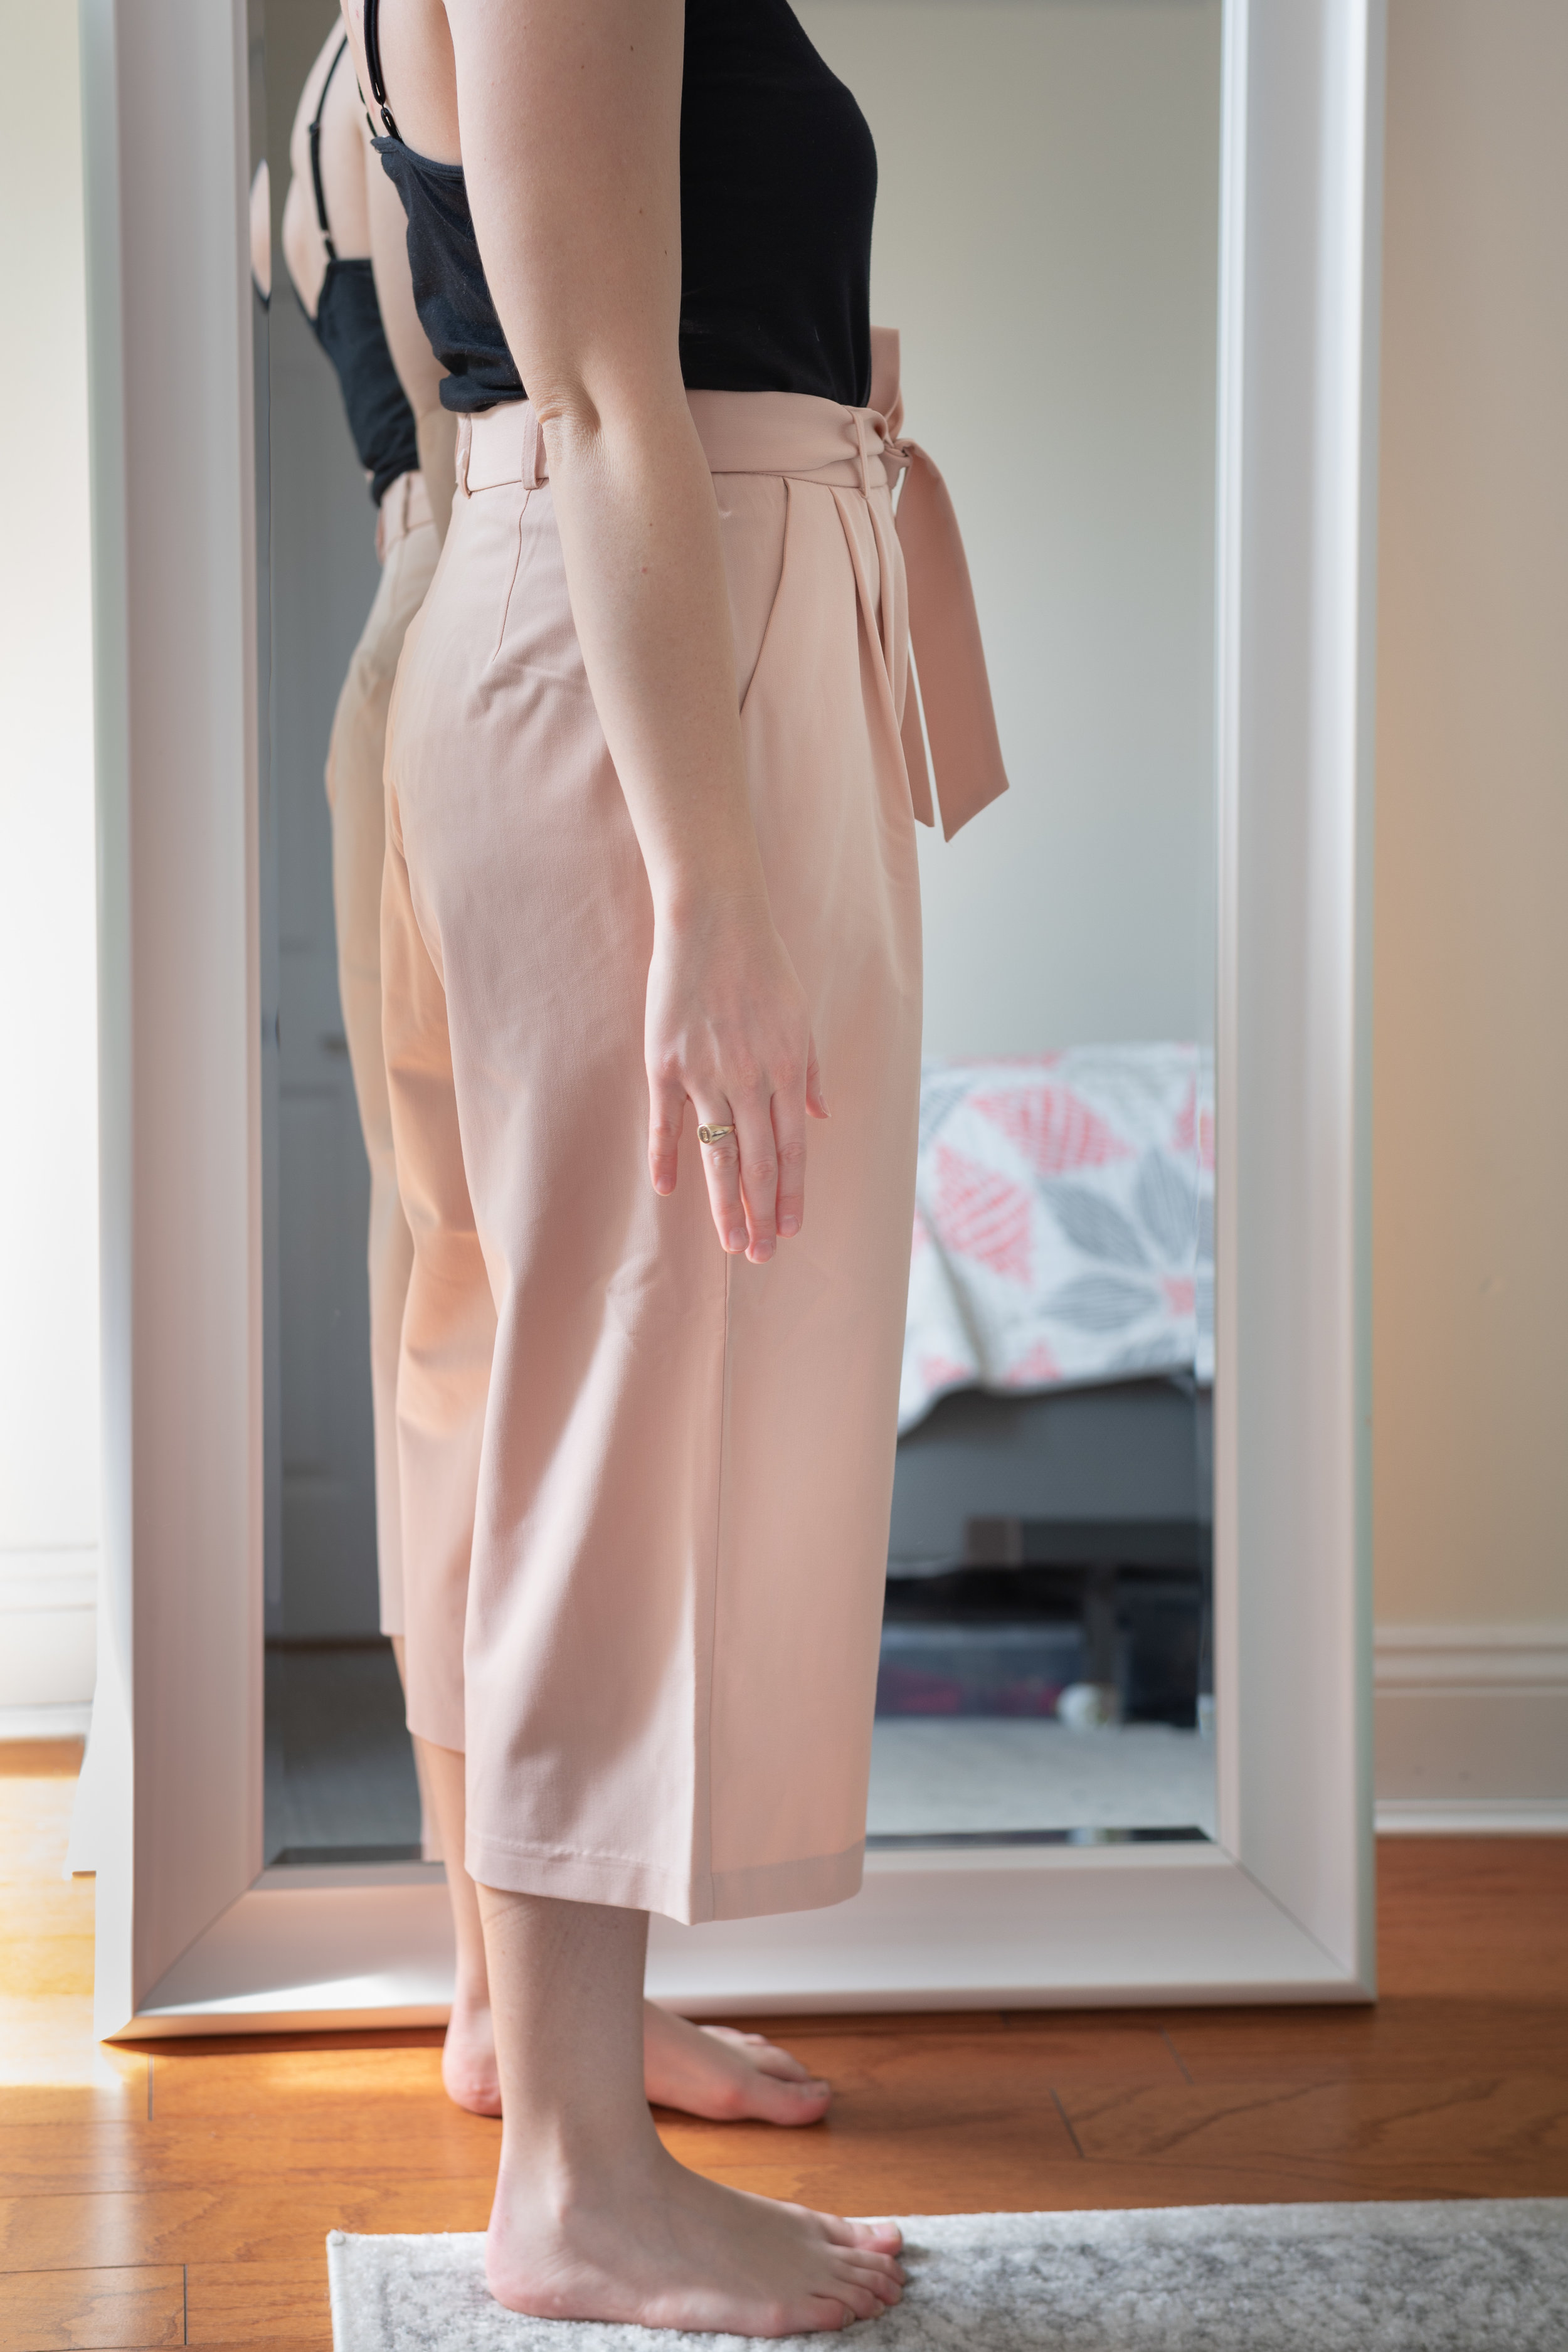 ASOS DESIGN Petite Mix & Match Culotte with Tie Waist - Size 6 Petite